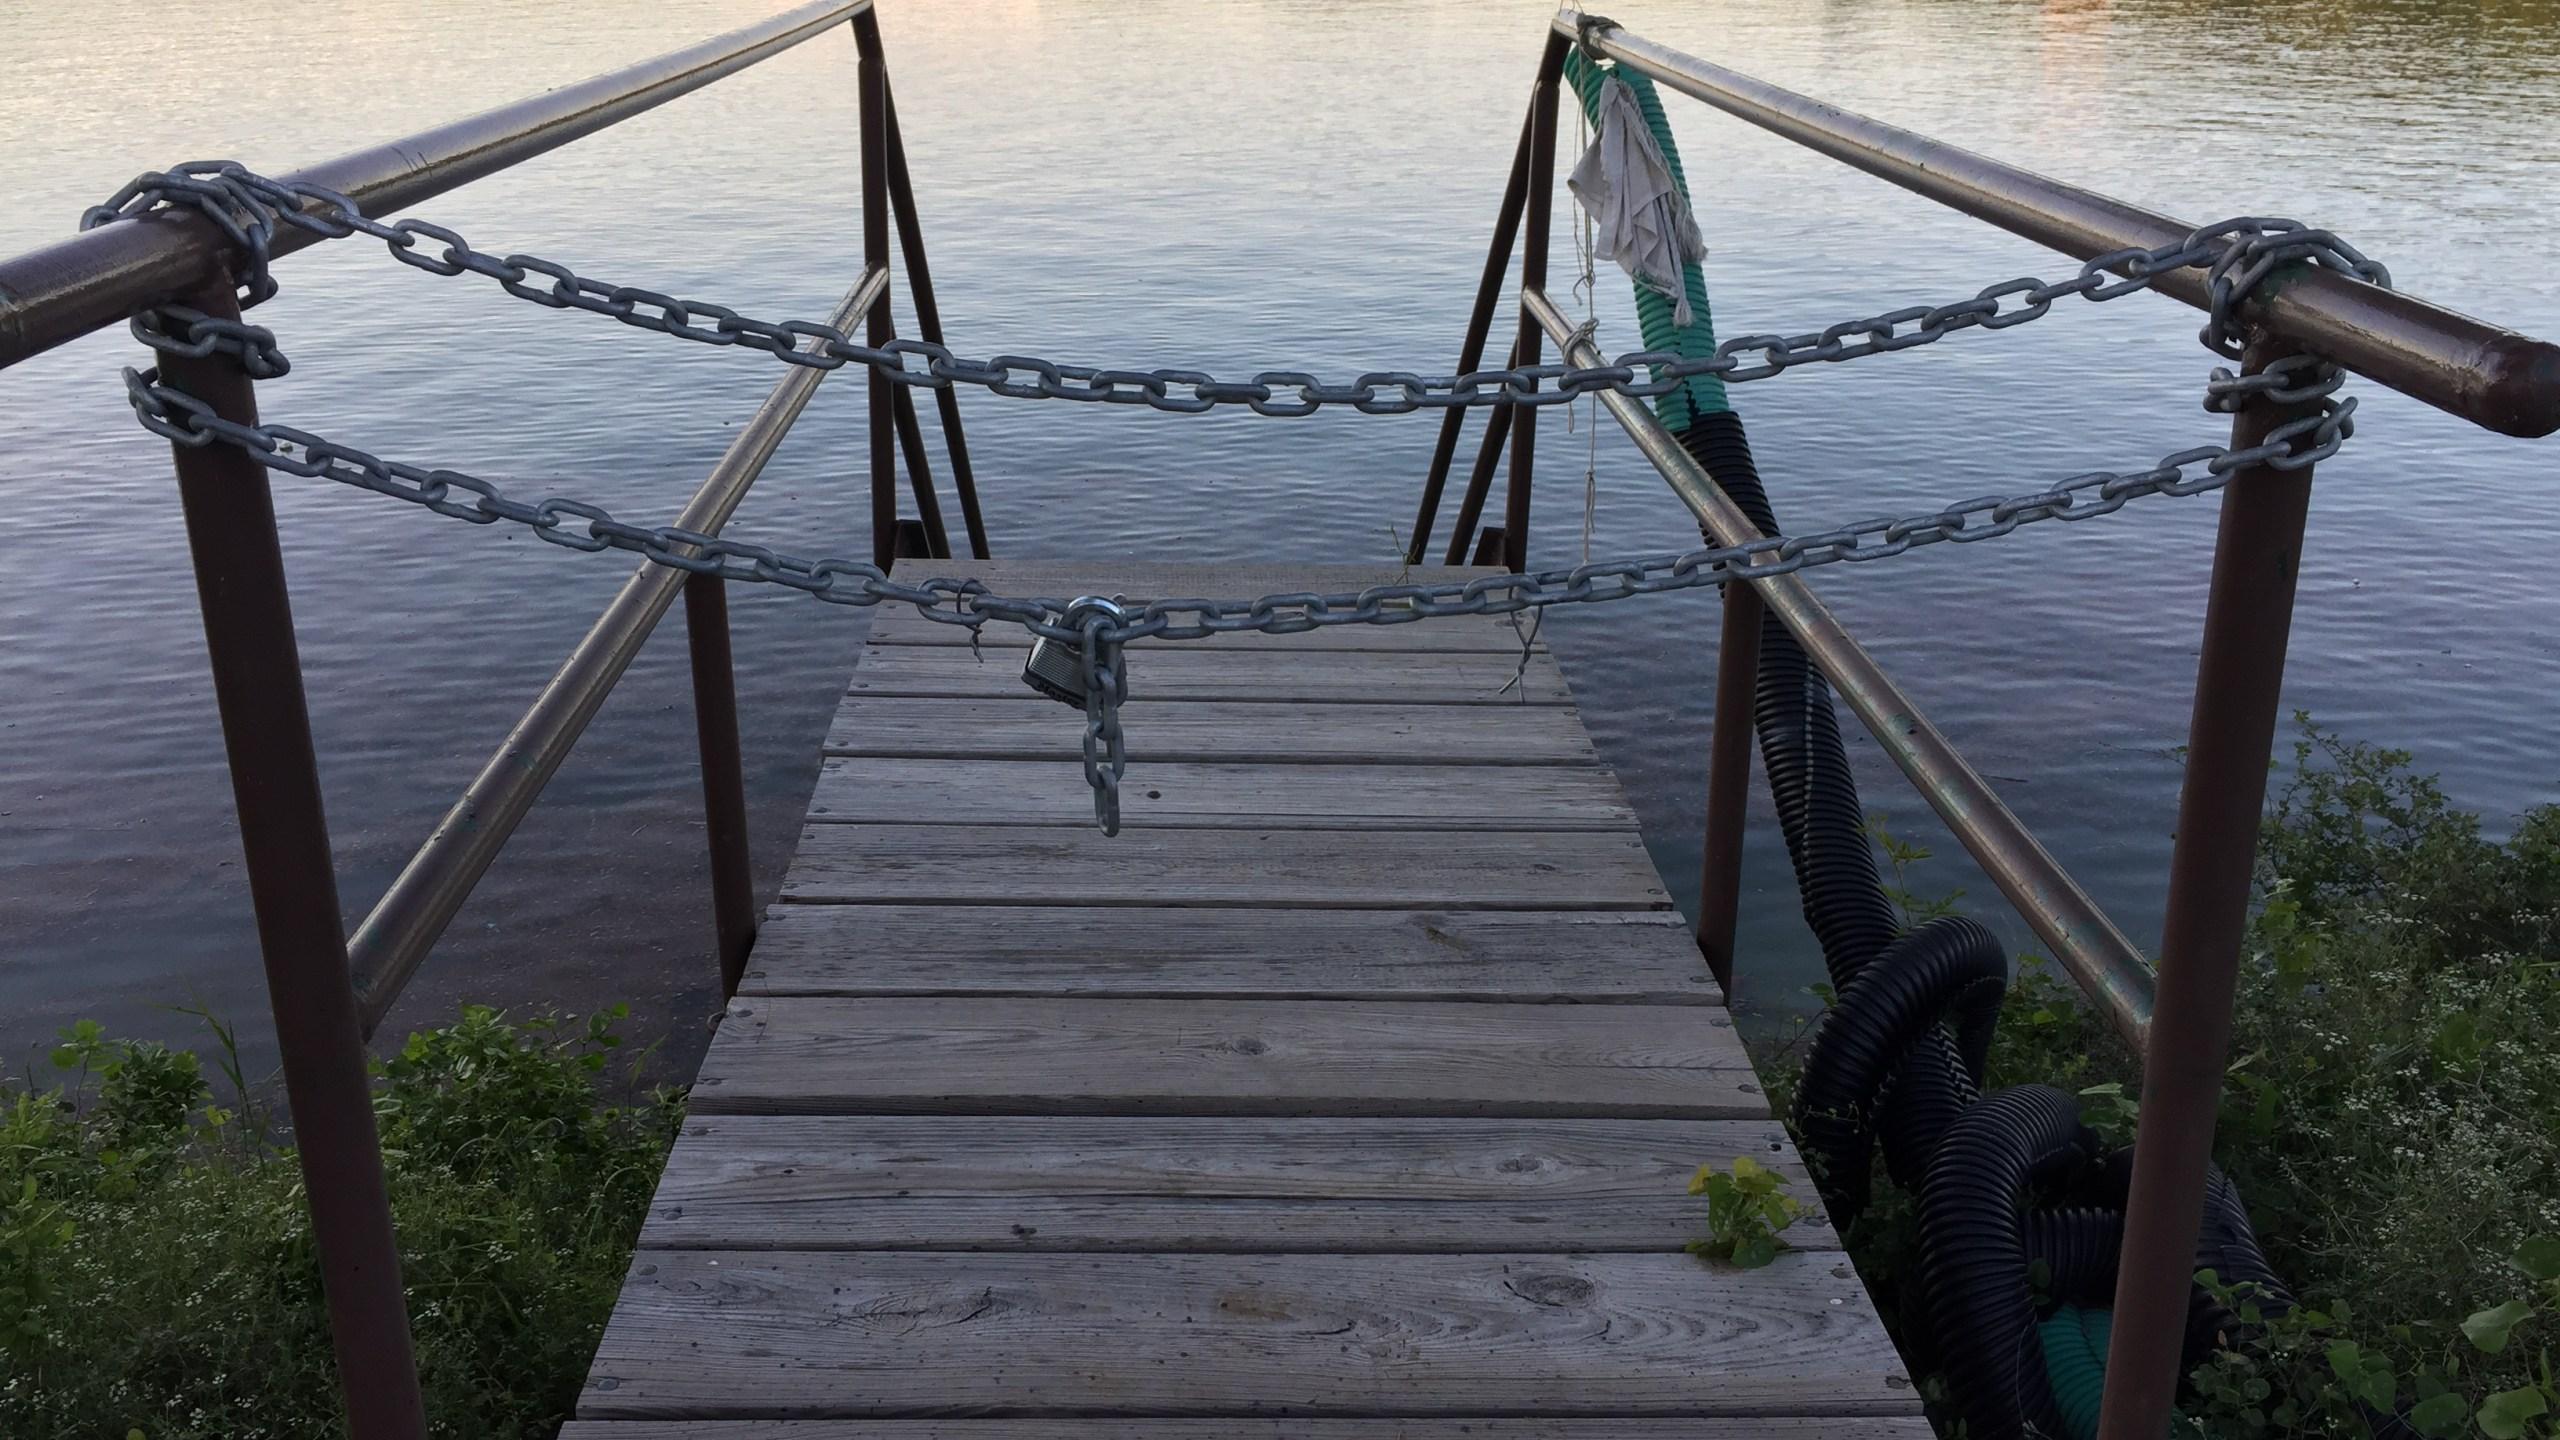 A man's body was found in Lake Travis near Jonestown_275599